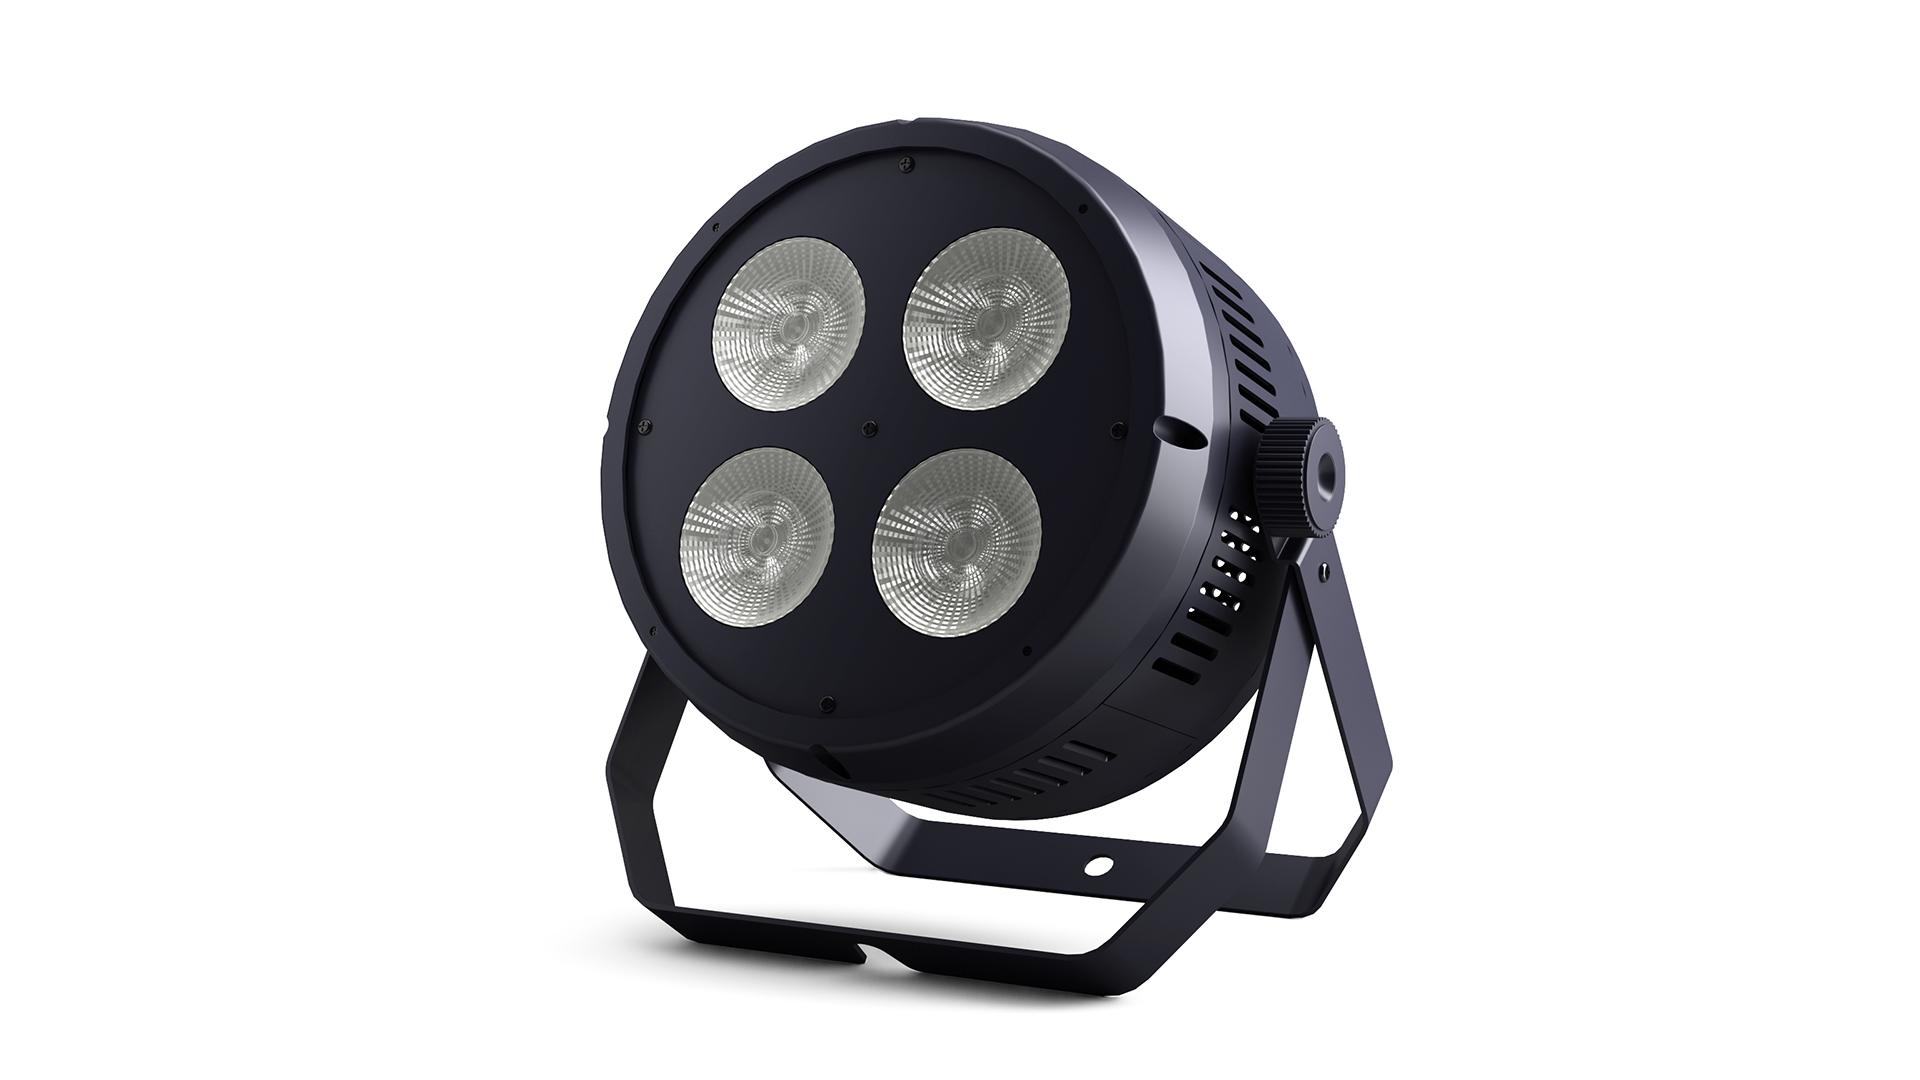 4*50W COB LED Indoor Par Light with good price - Yellow River